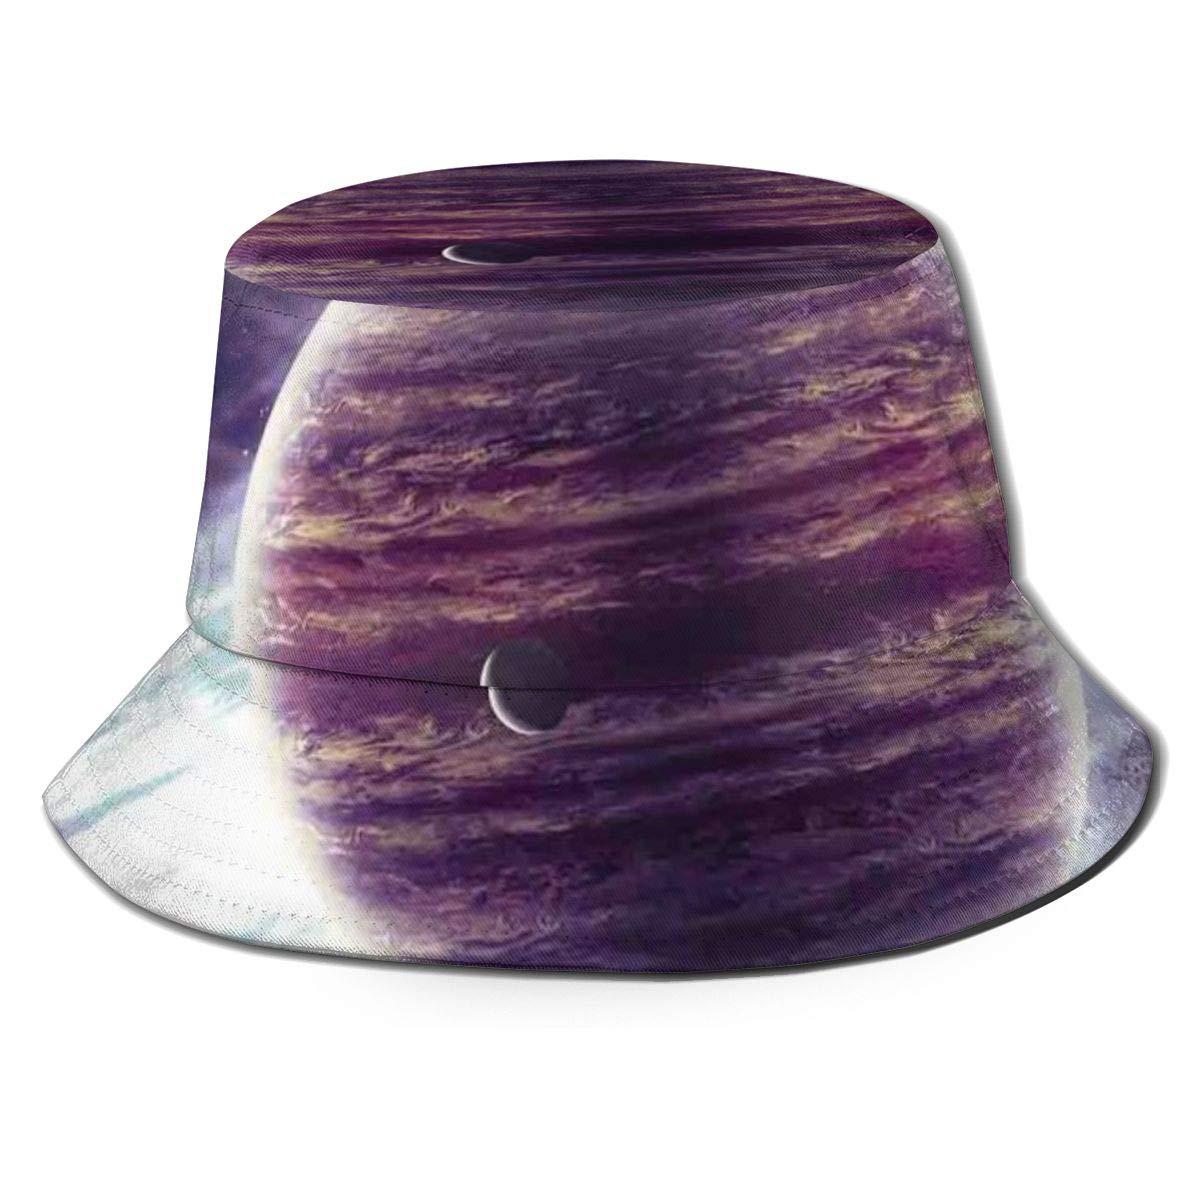 Unisex Summer Fisherman Cap,Outer Space Theme Planets Saturn Mars Neptune Science Fiction Solar Scene Artprint,Travel Beach Outdoor Sun Hat